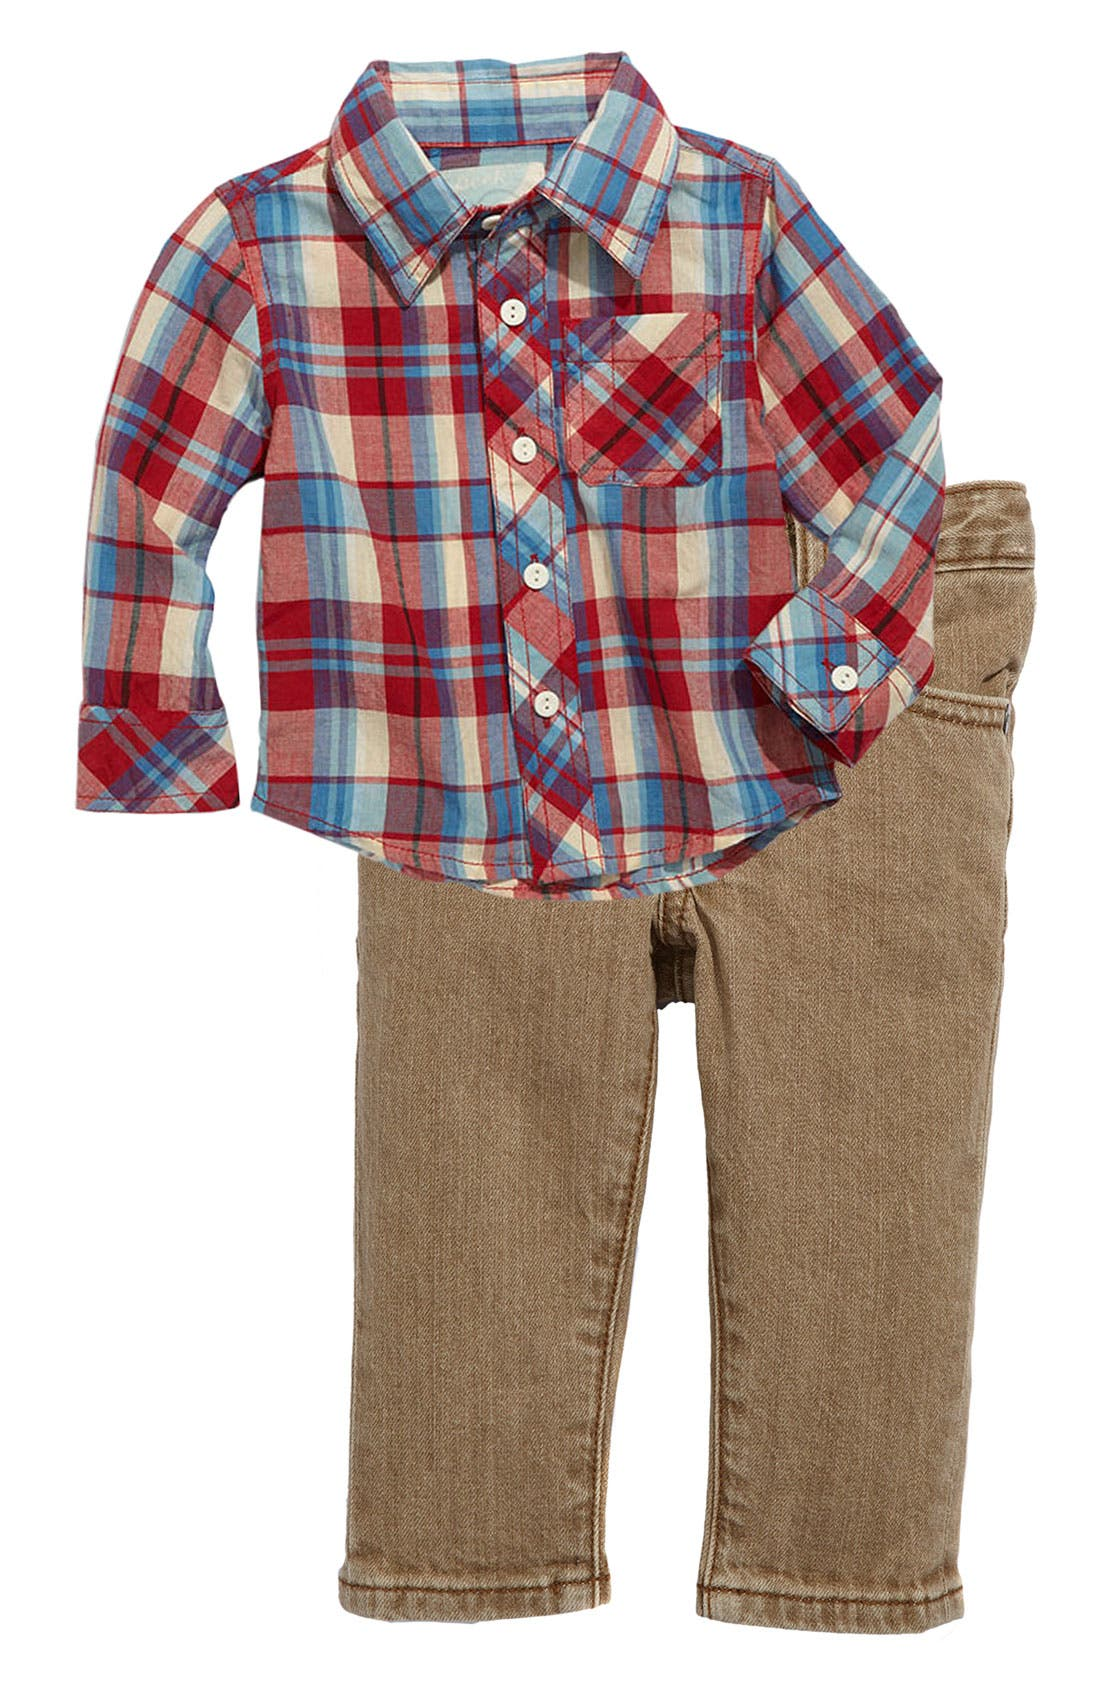 Alternate Image 1 Selected - Peek Plaid Shirt & Jeans (Infant)